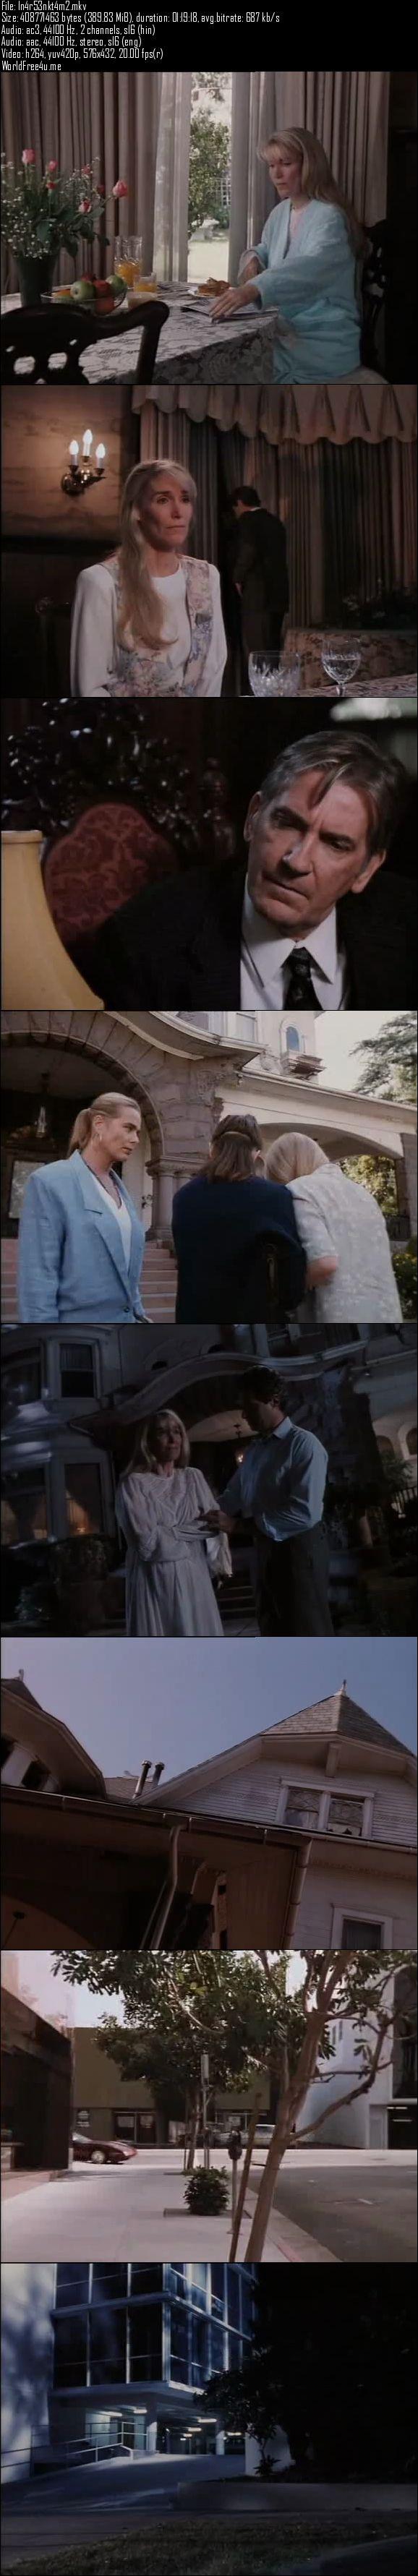 Backfire movie 1988 online dating 1